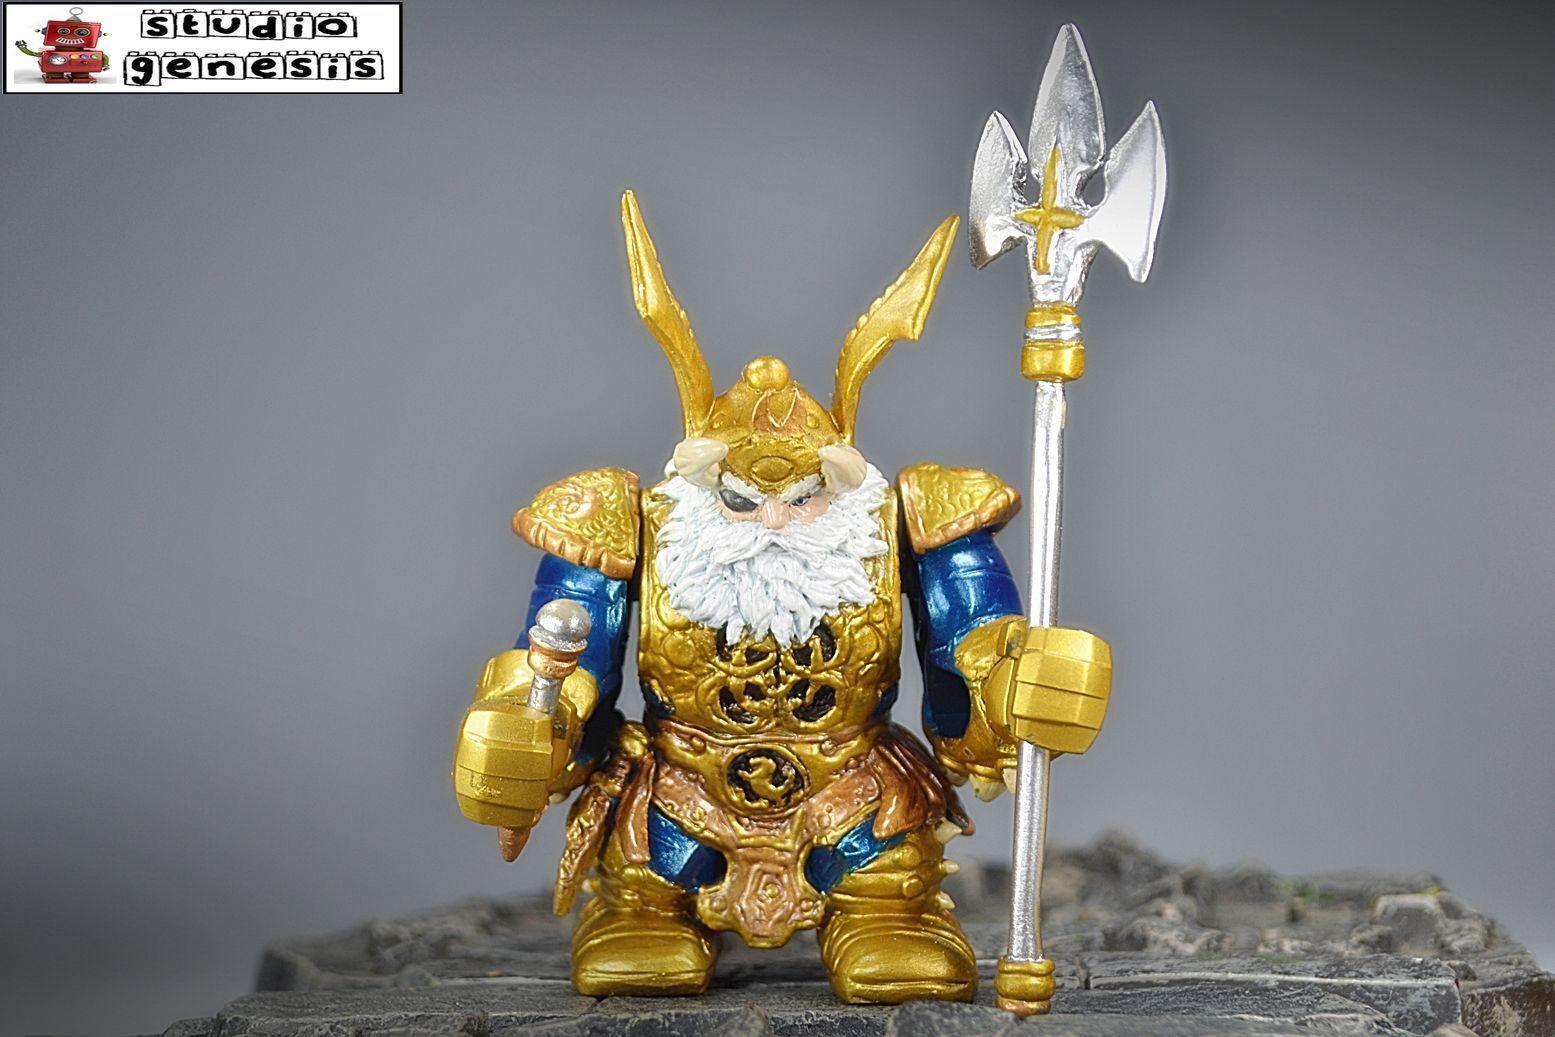 New Custom Odin Super Hero Thor Figure Big Hulk Fig Minifigure   eBay